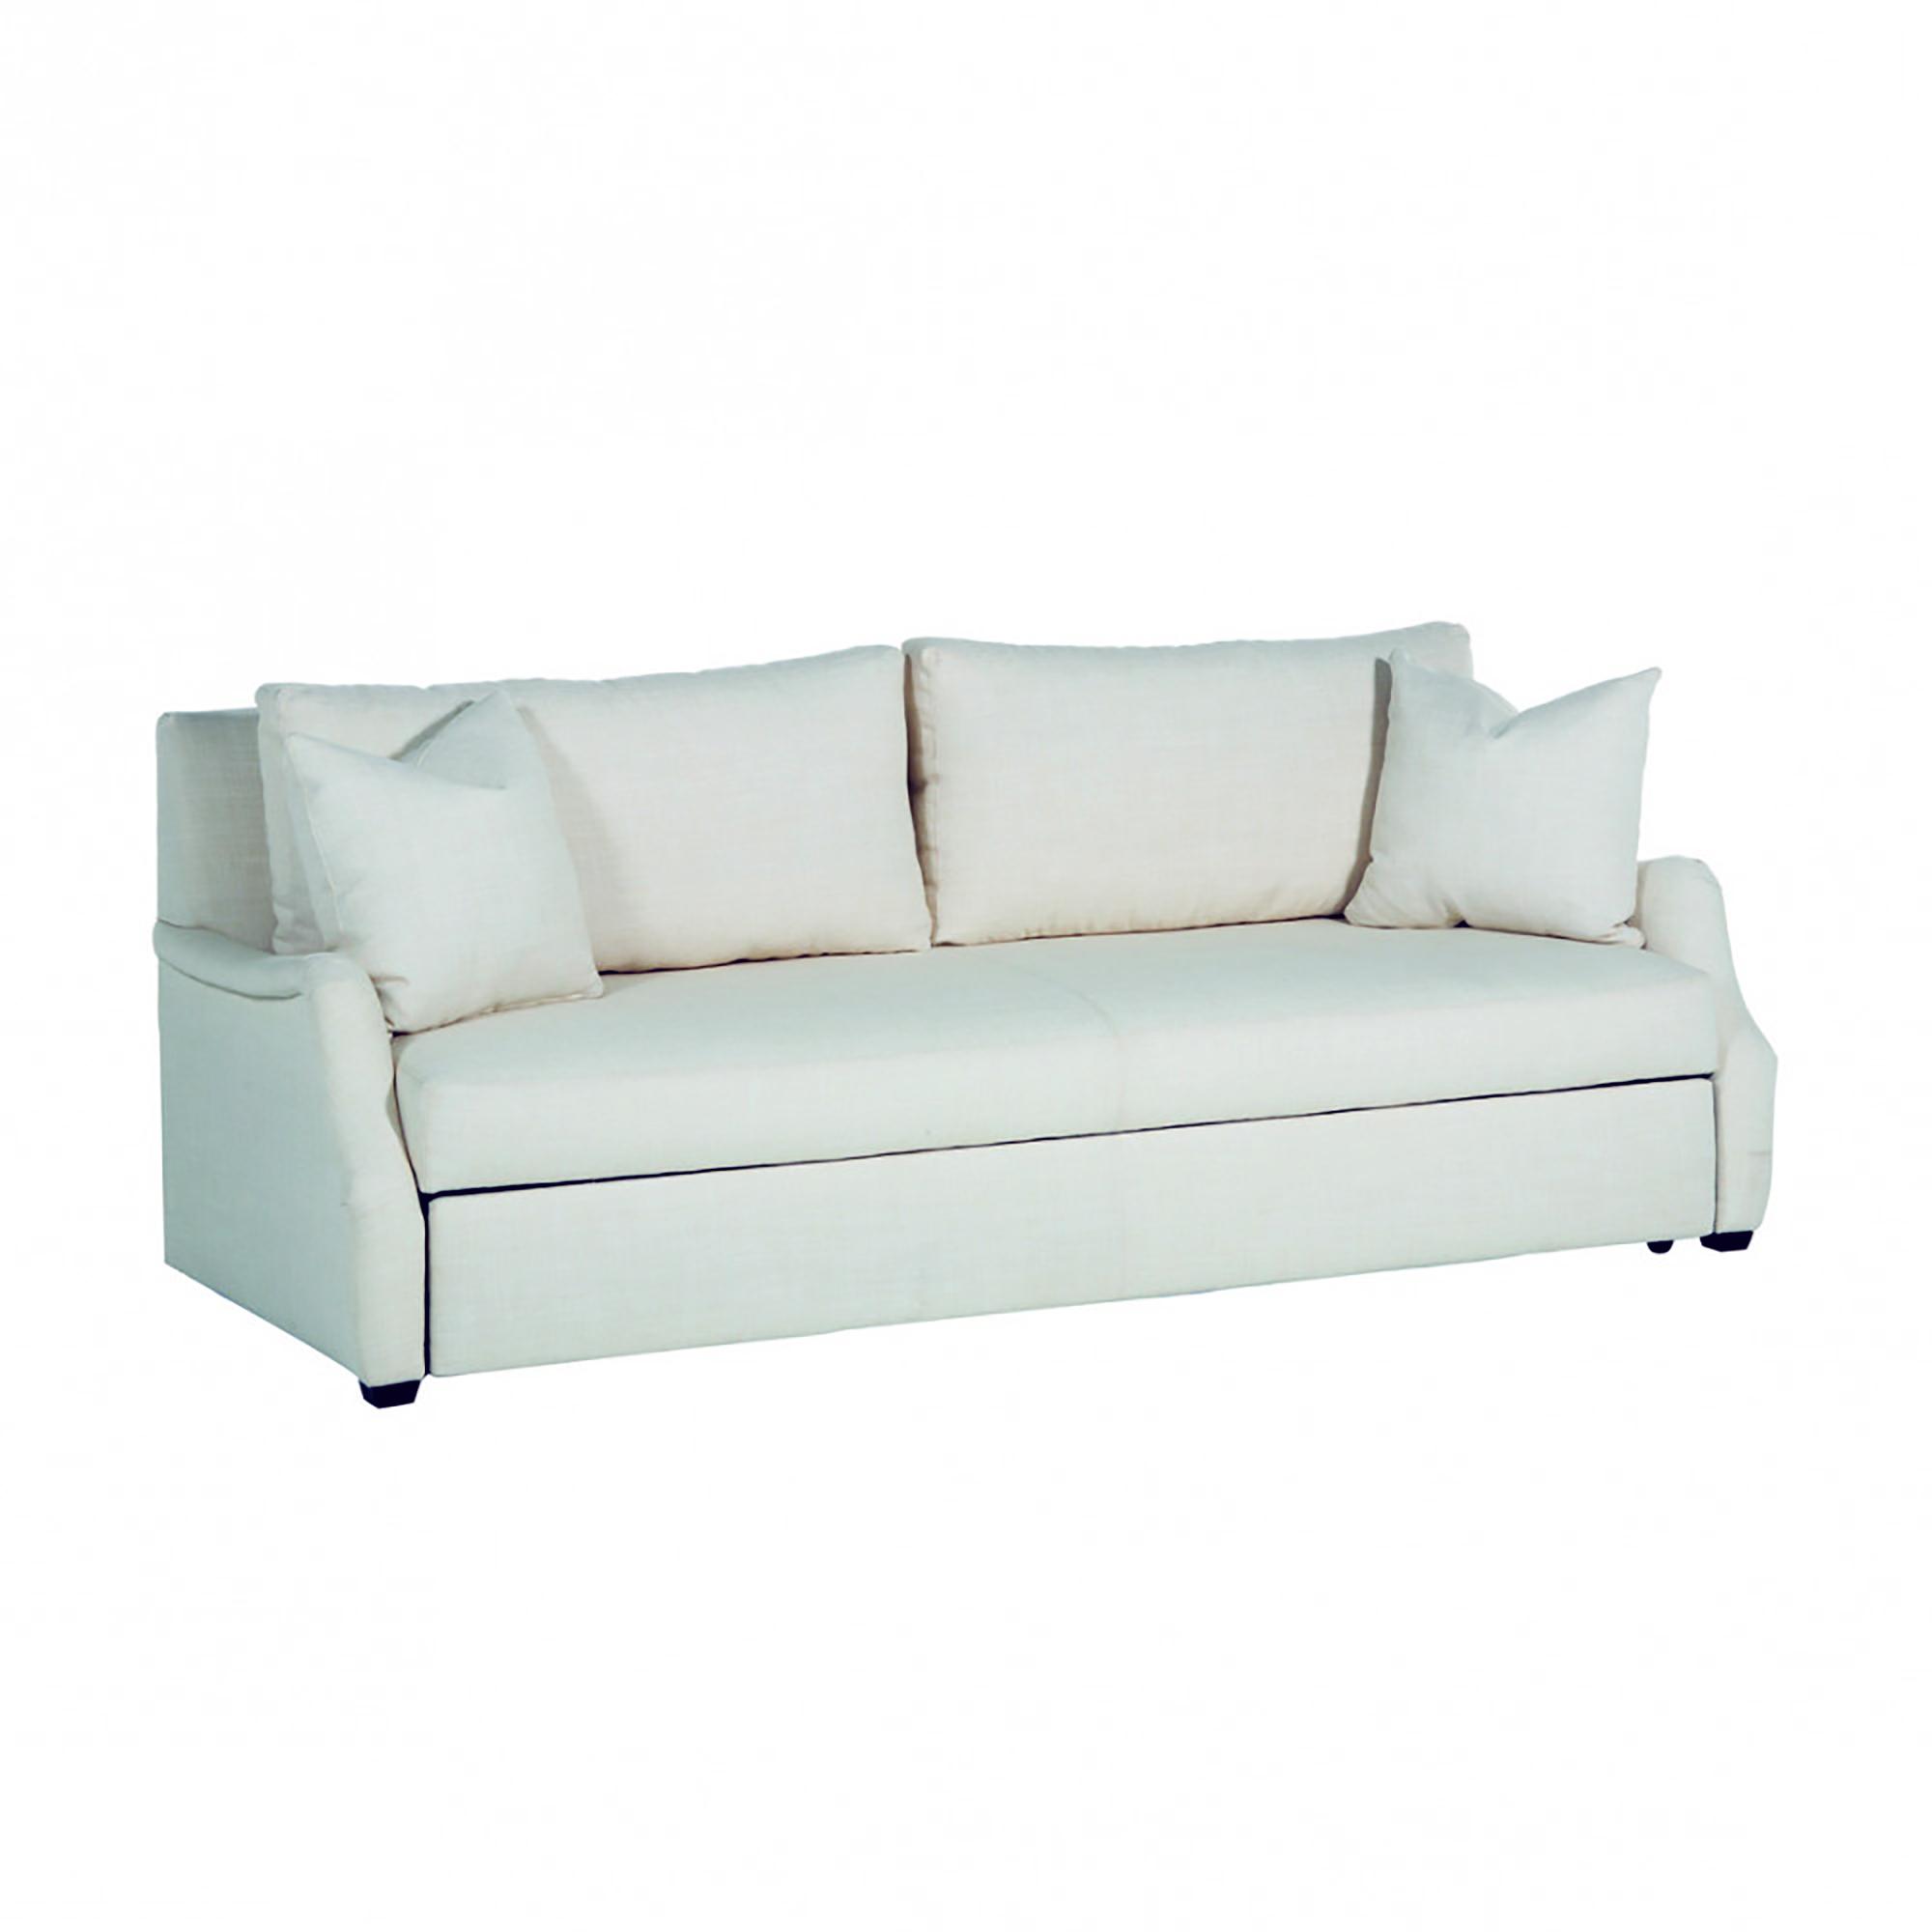 Groovy Stafford Sleeper Sofa Bralicious Painted Fabric Chair Ideas Braliciousco